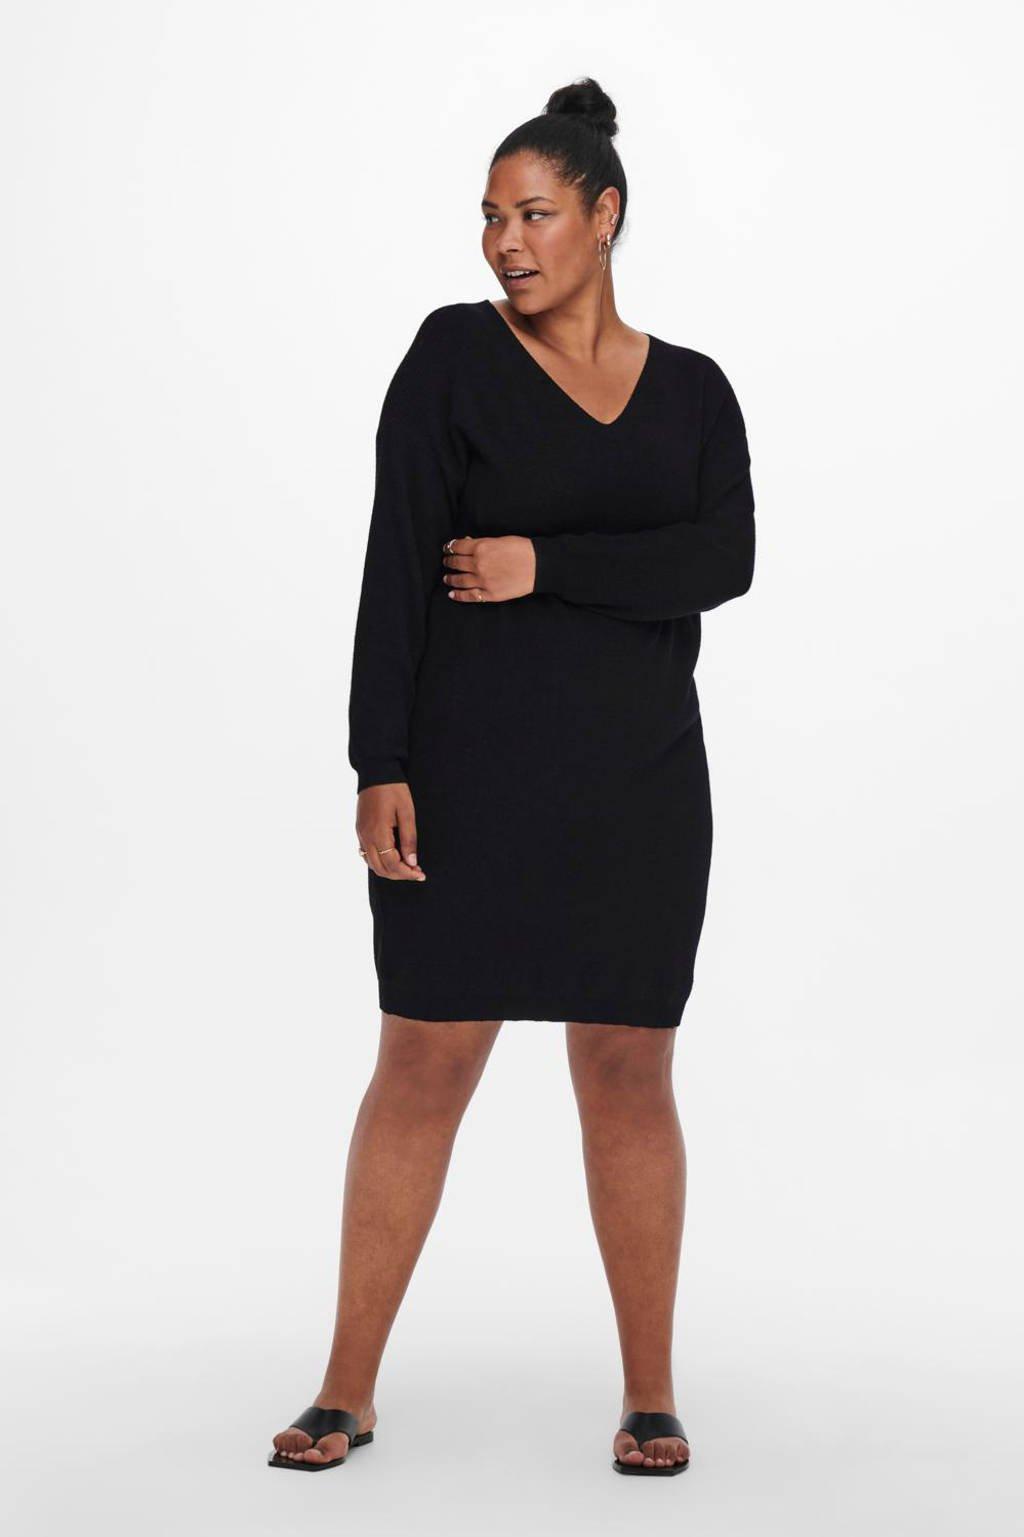 ONLY CARMAKOMA ribgebreide jurk CARESLY  LS V-NECK KNEE  DRESS KNT NOOS zwart, Zwart